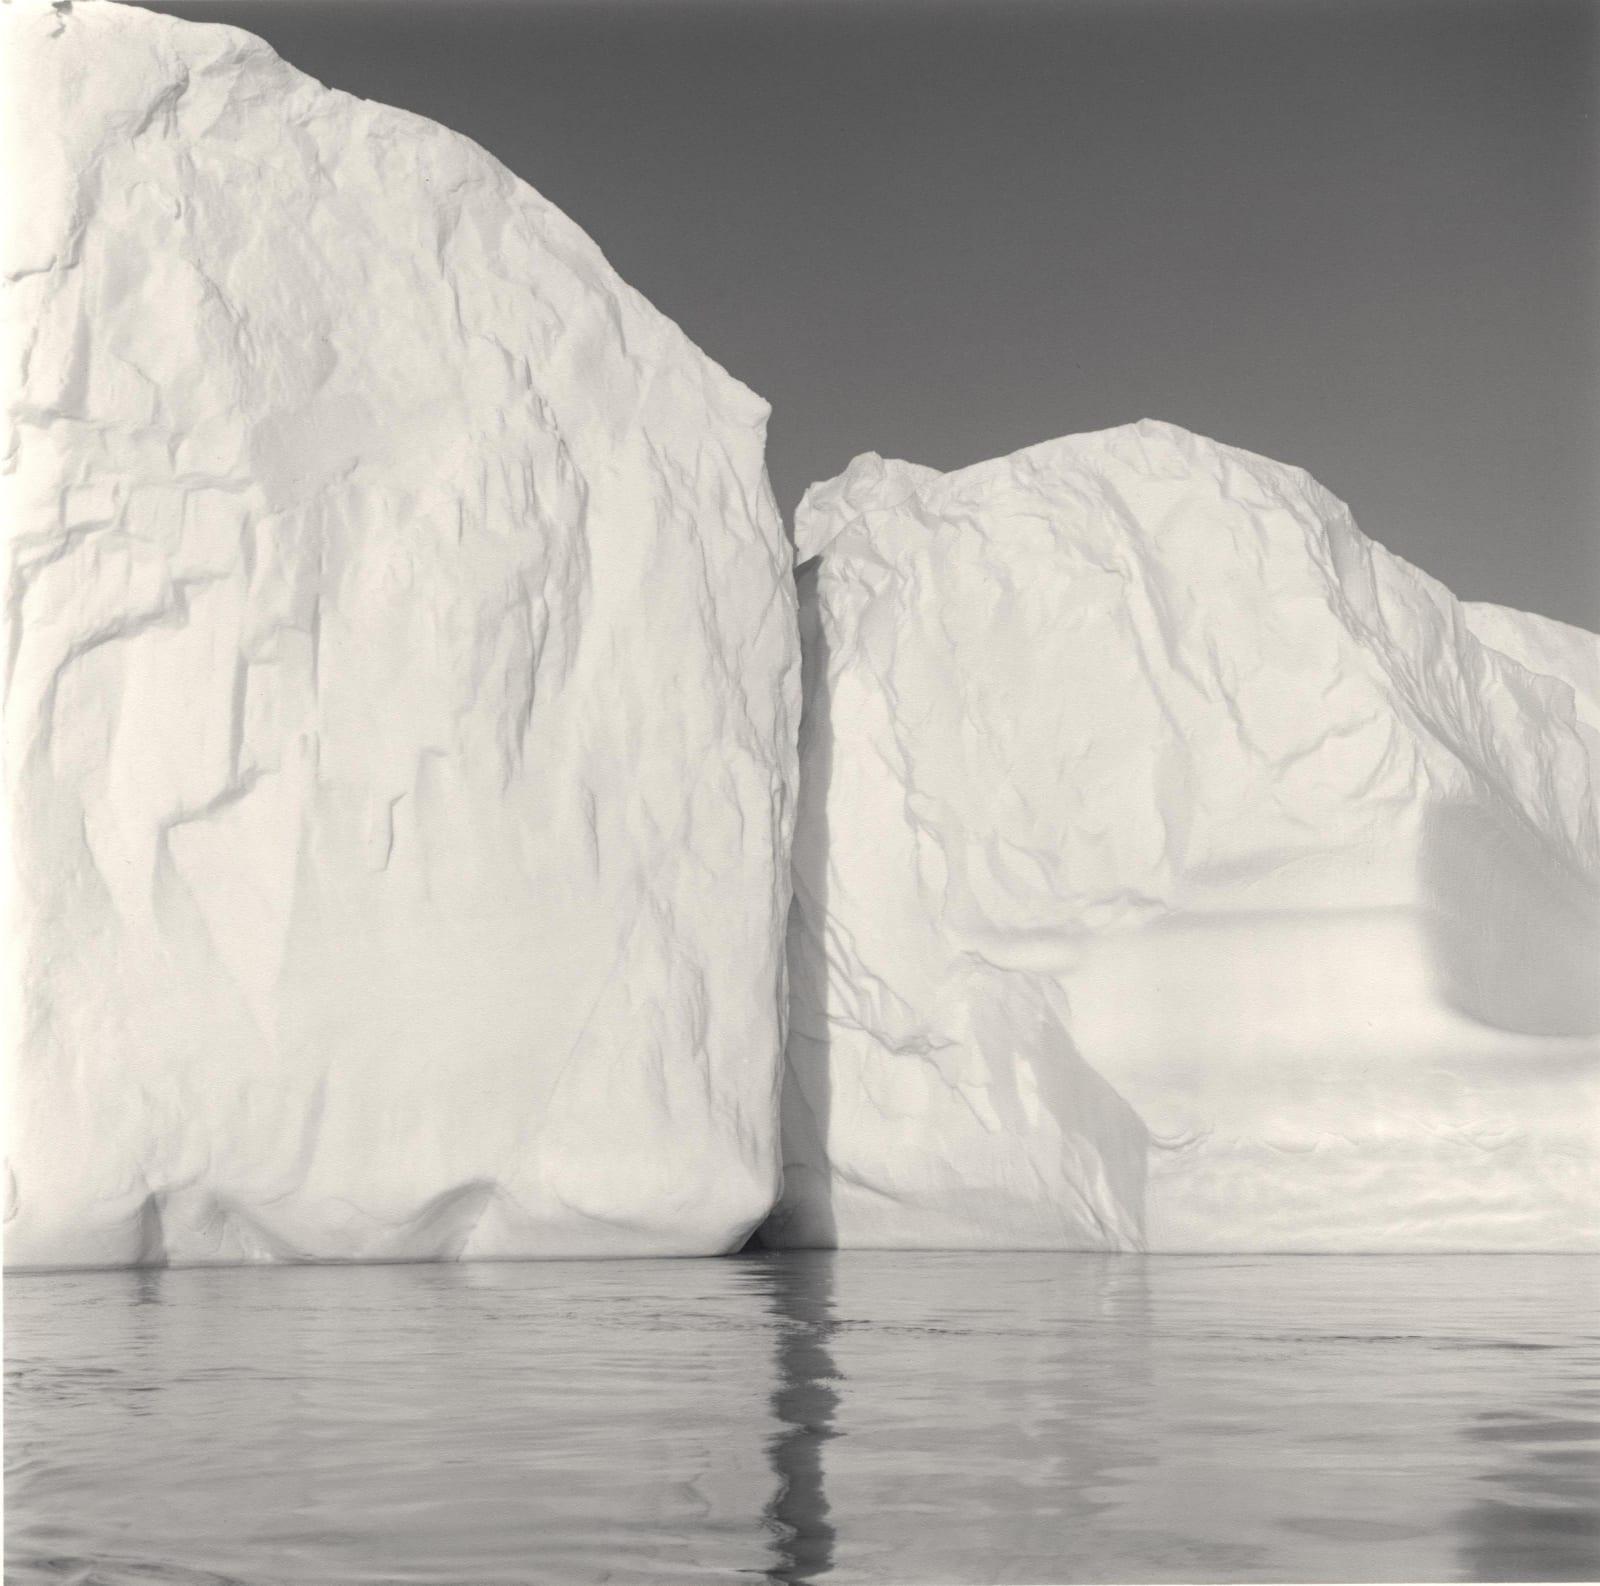 Lynn Davis, Iceberg #26, Disko Bay, Greenland, 2000